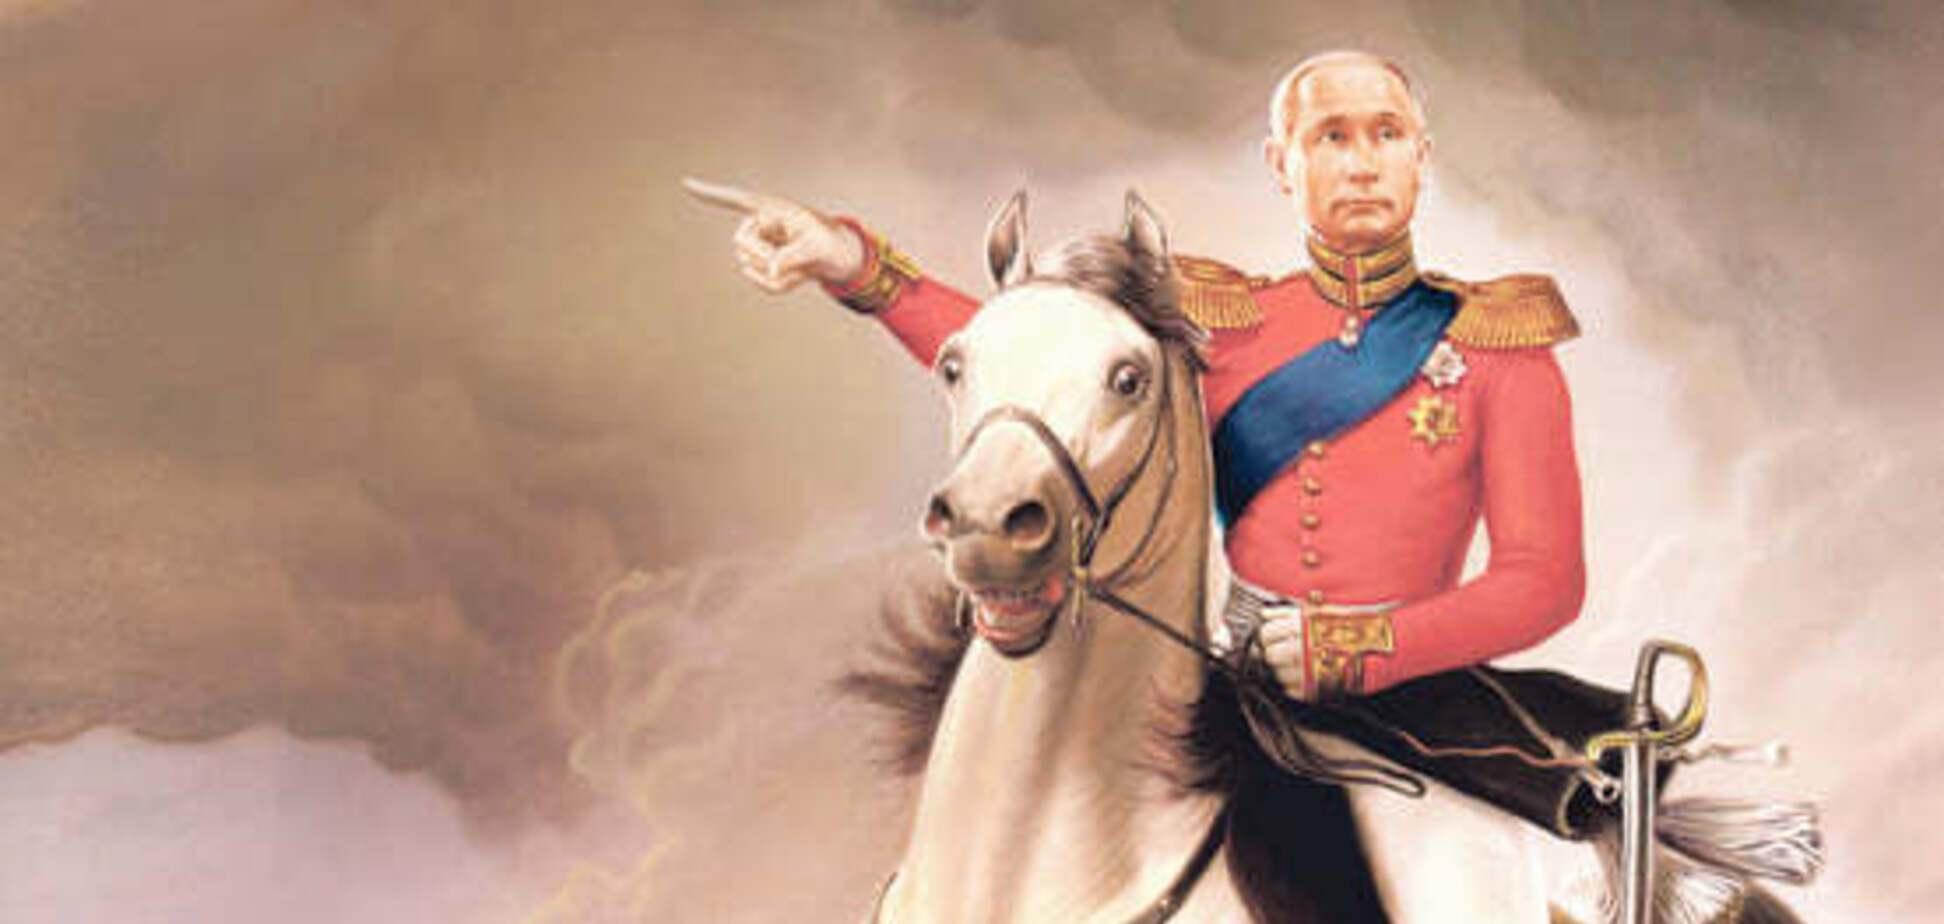 Истерика на русских каналах в США, или Байден – не Путин